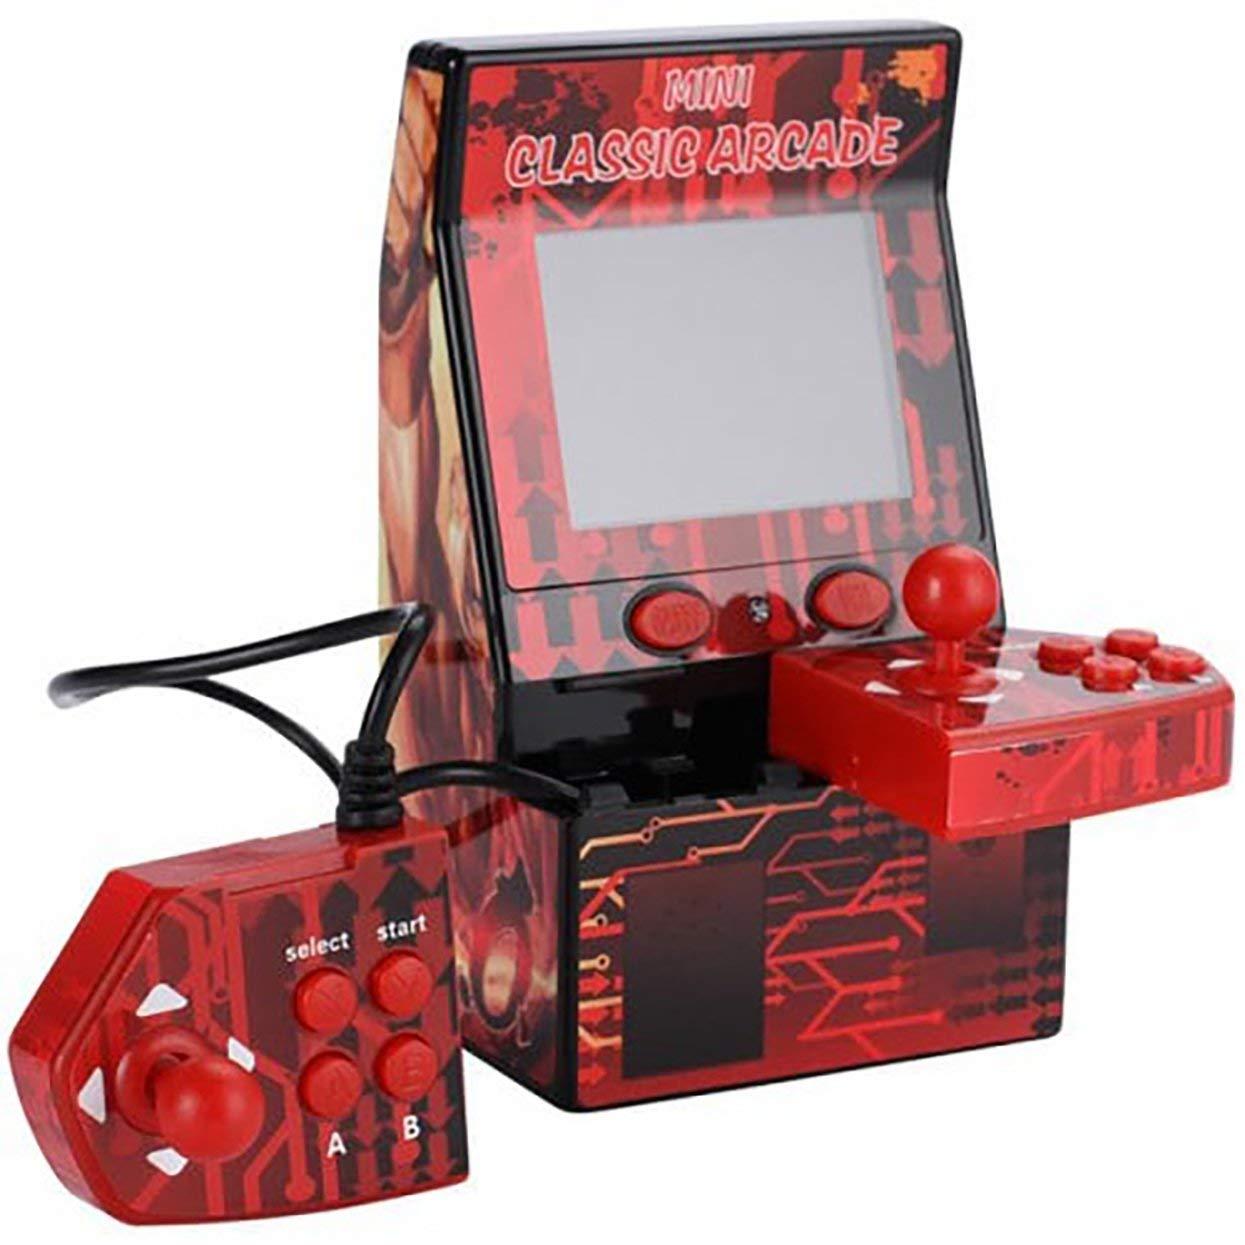 Retro Mini Portable Arcade Machine Classical Retro Handheld Video Game Console Built-in 183 Arcade Games by Lamijua (Image #1)